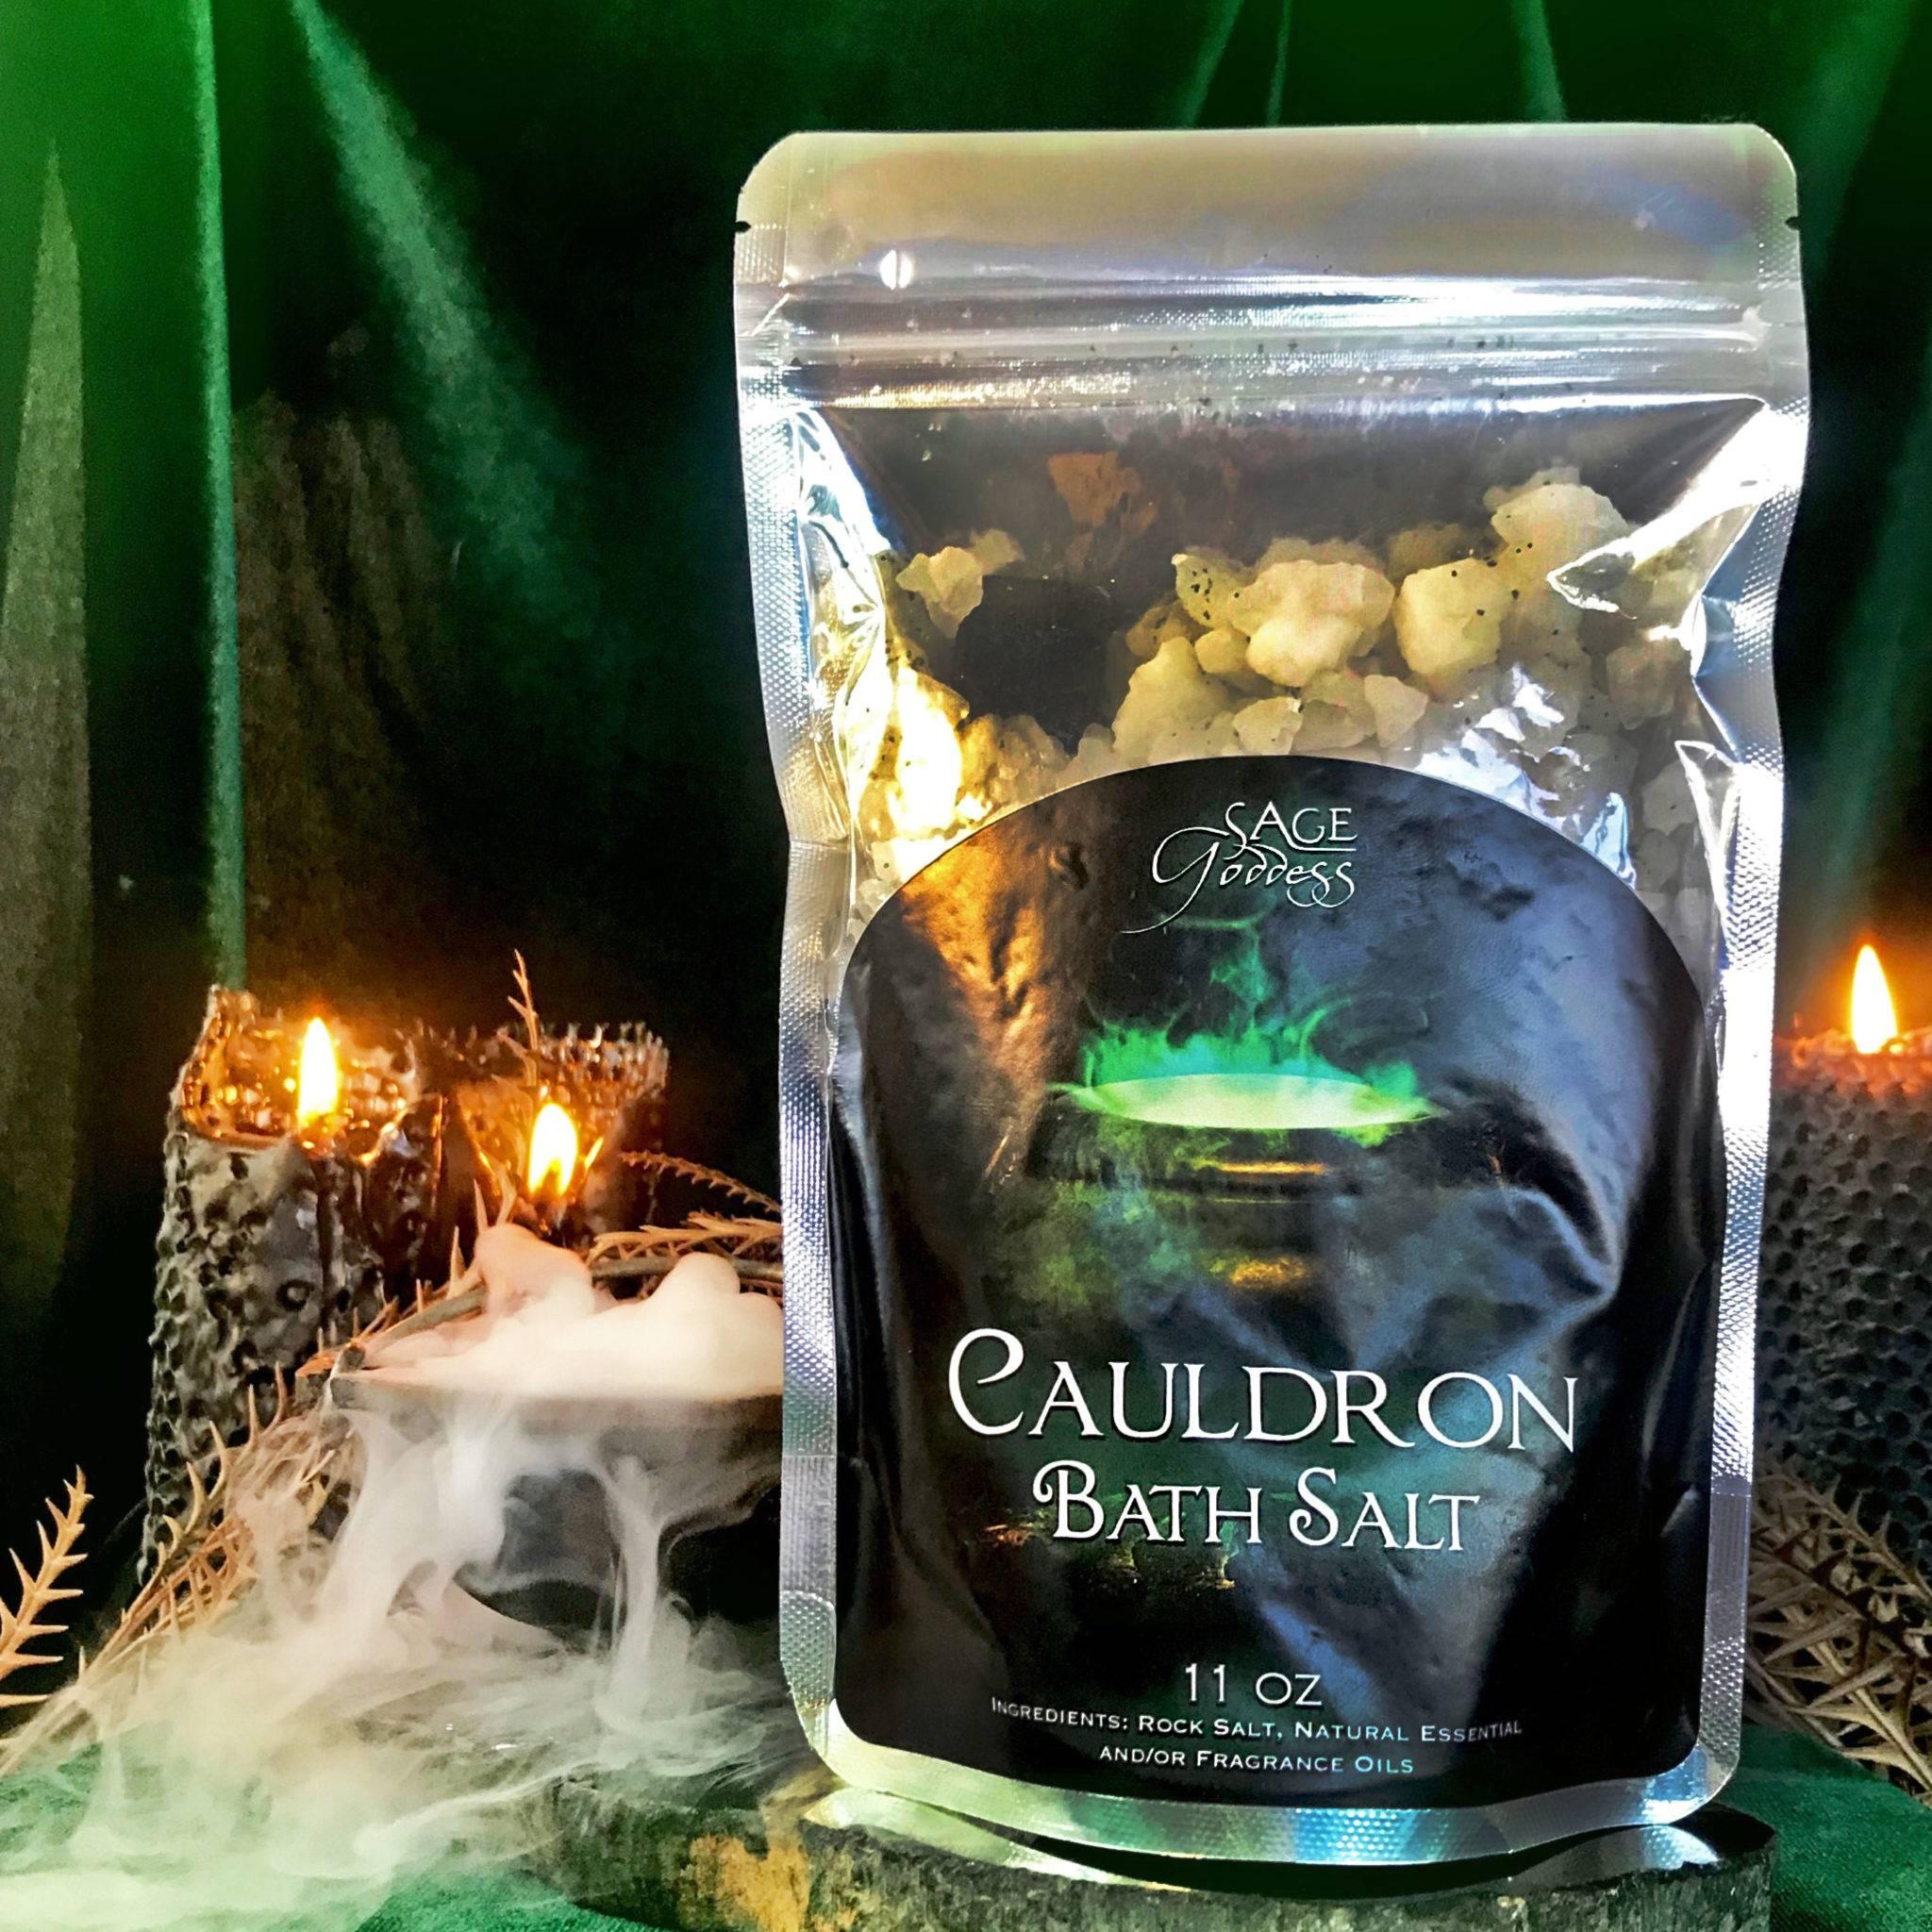 Cauldron Bath Salts for wisdom, grounding, and personal strength